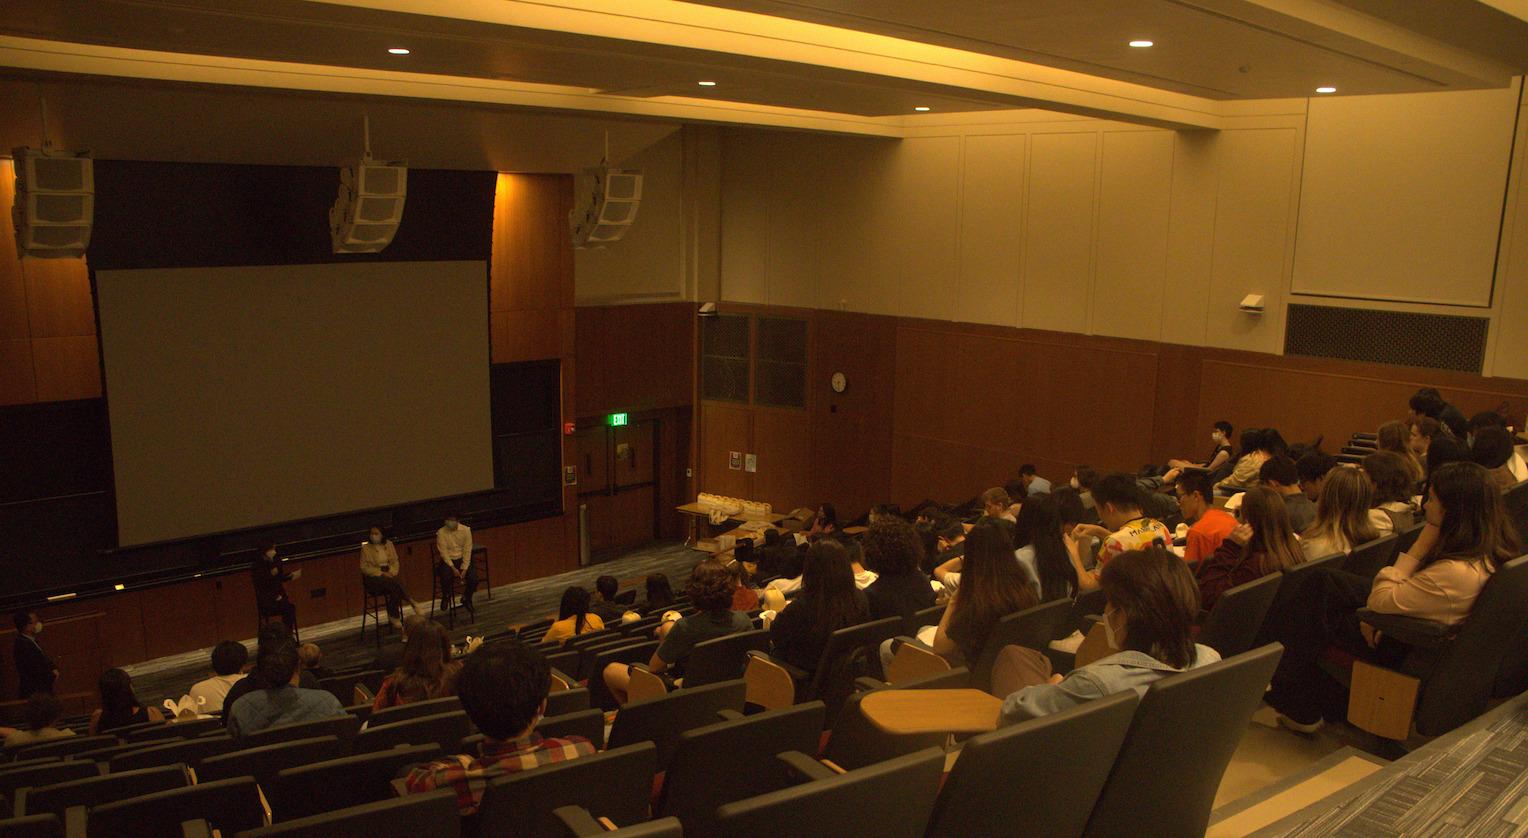 www.bcheights.com: 'Minari' Panel Presents Unique Asian American Experiences